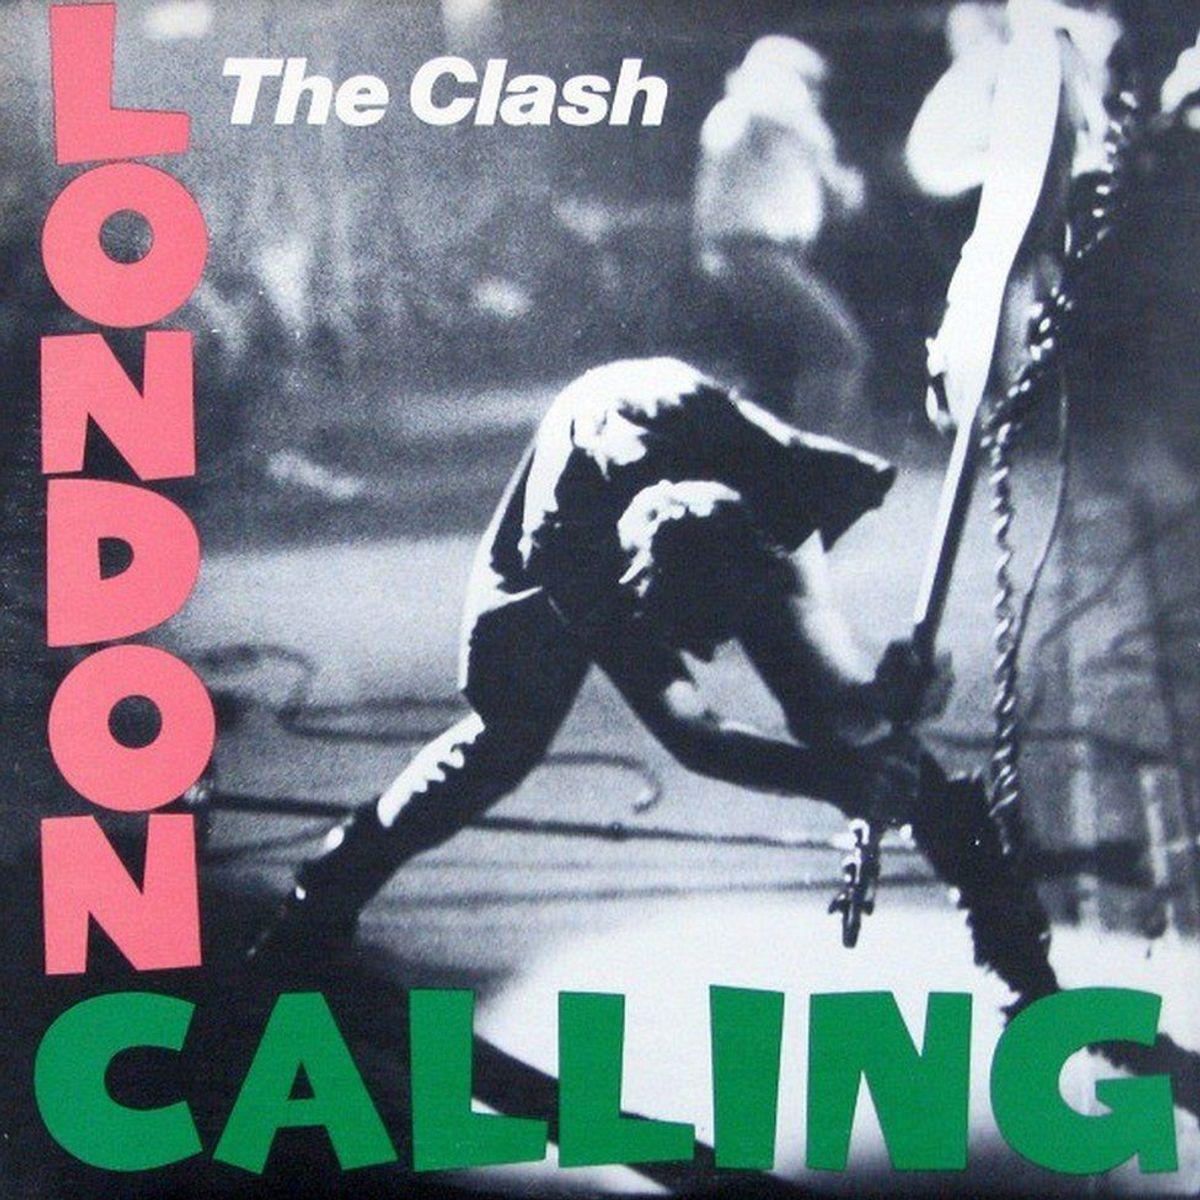 #Dubbelaars - The Clash - London Calling - 'London Calling' (1979)